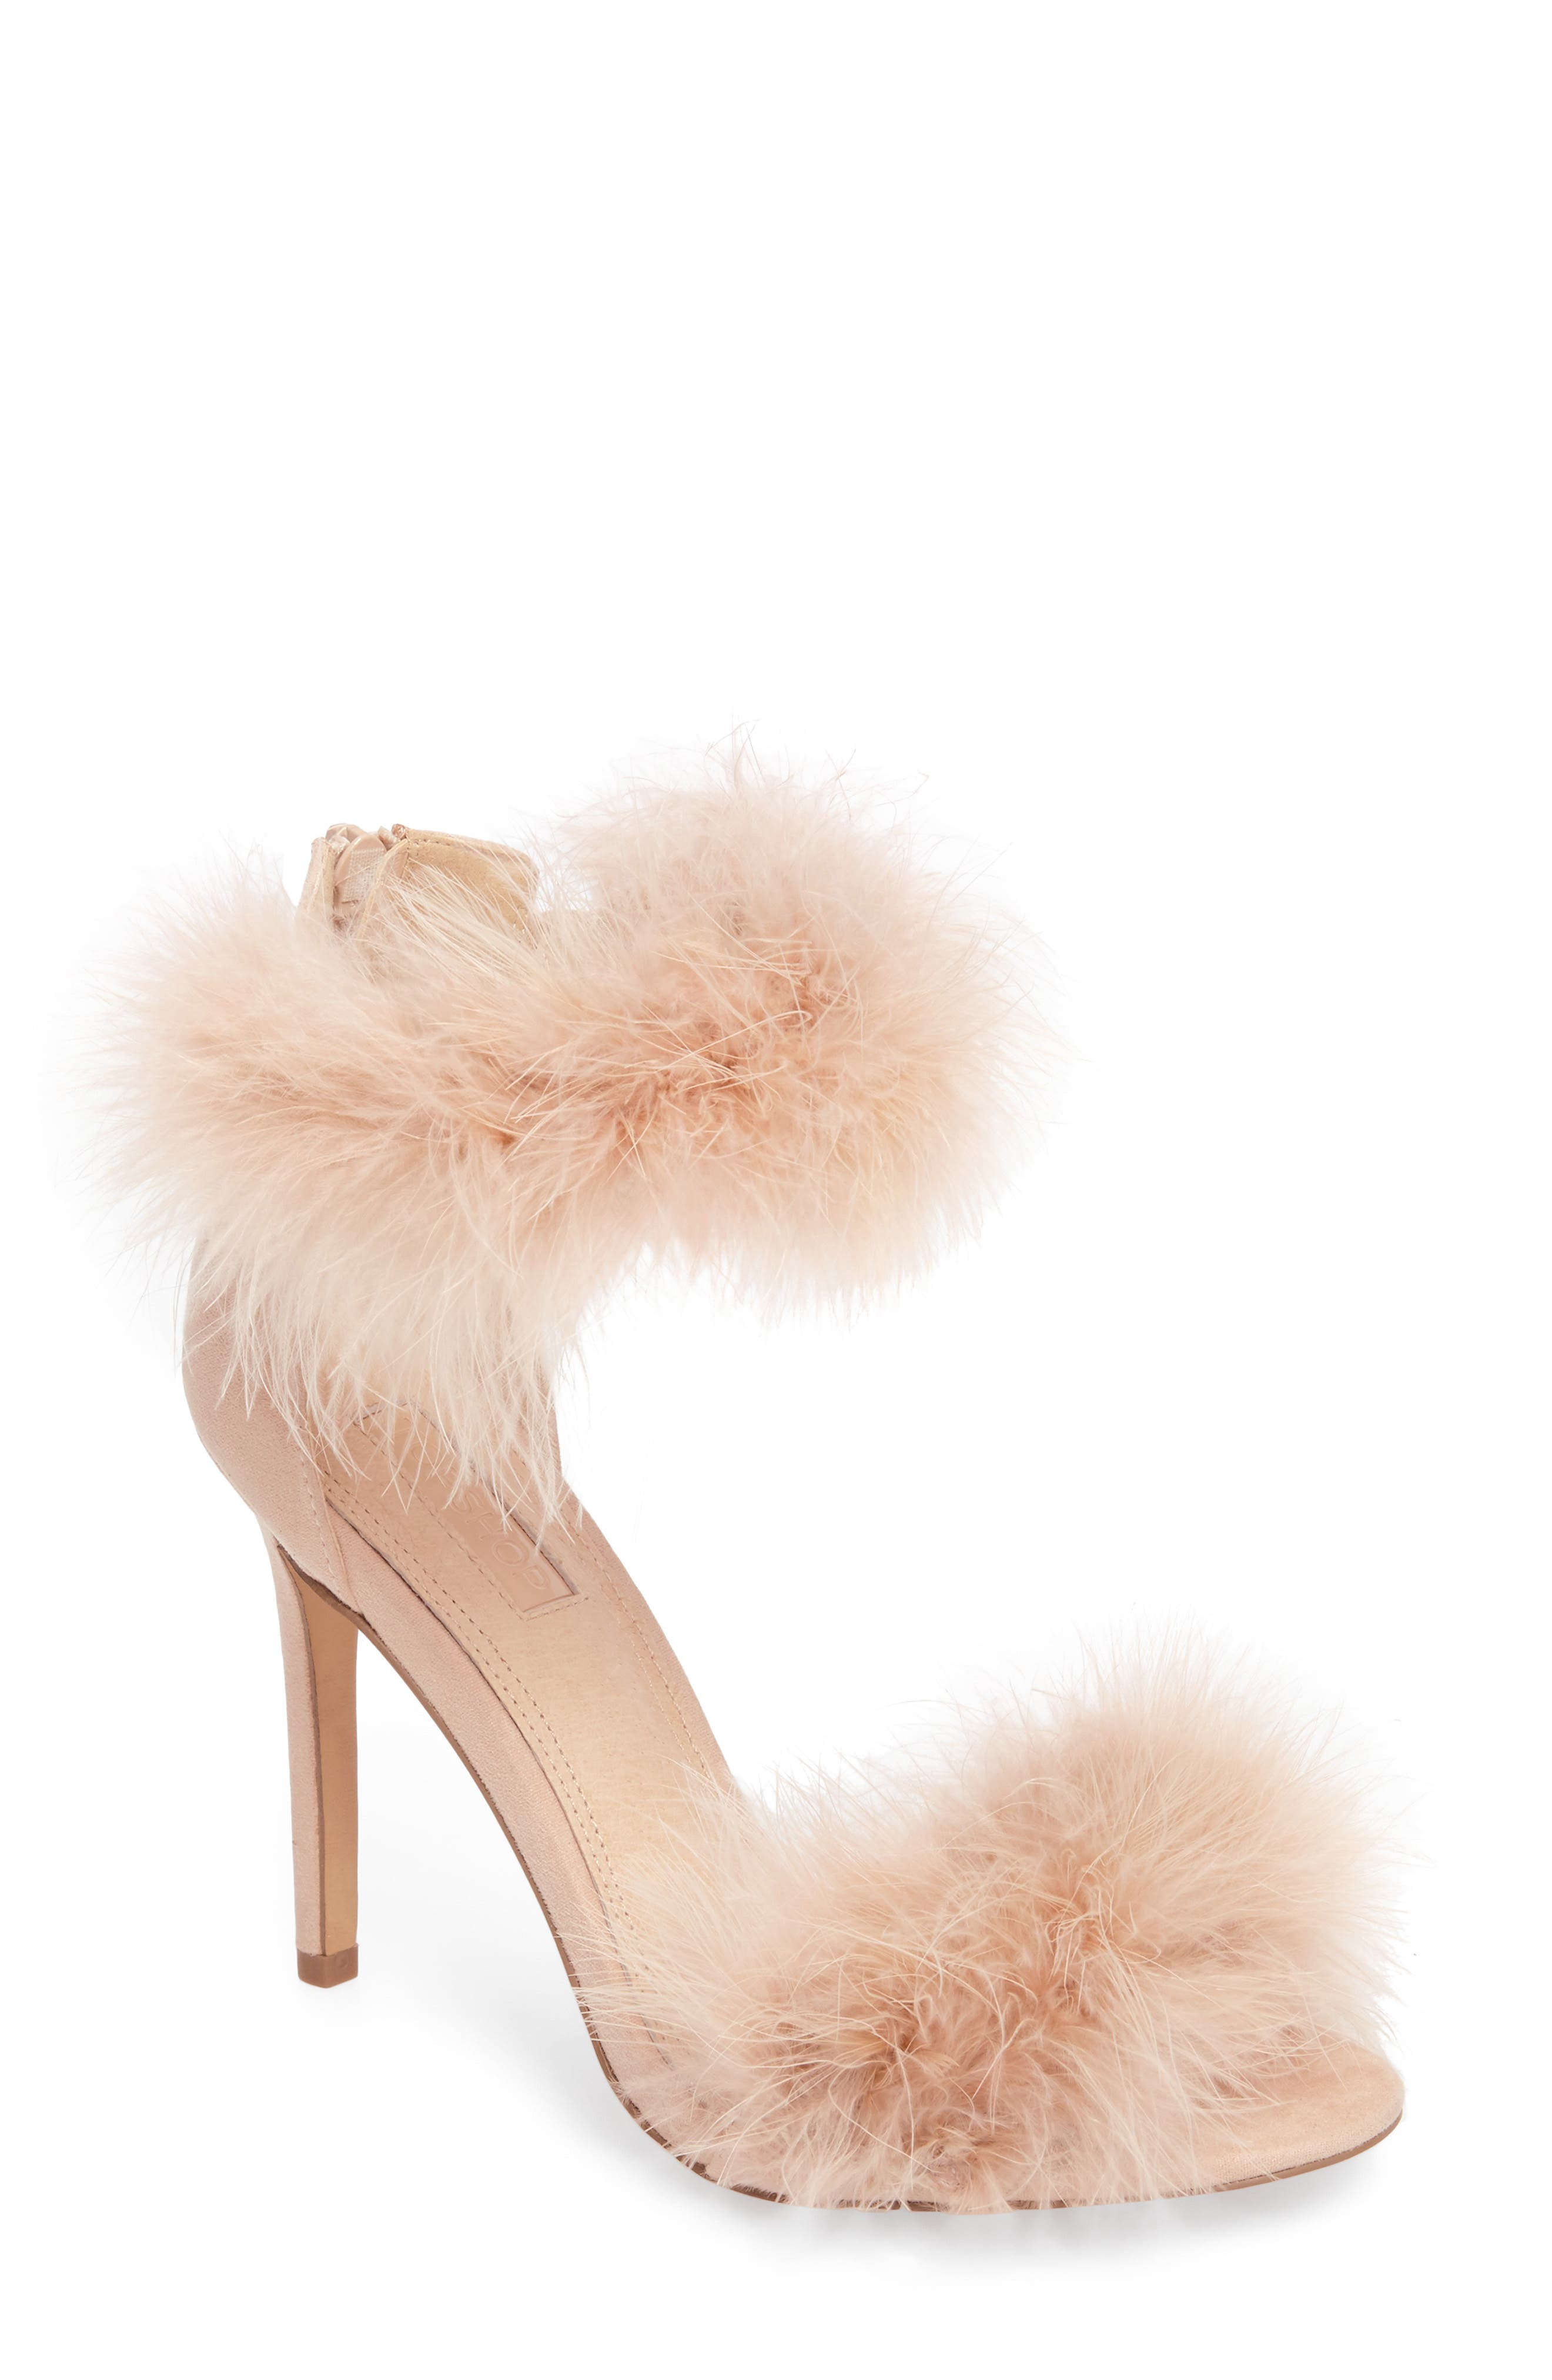 Feather Strap Sandal,                         Main,                         color, 250